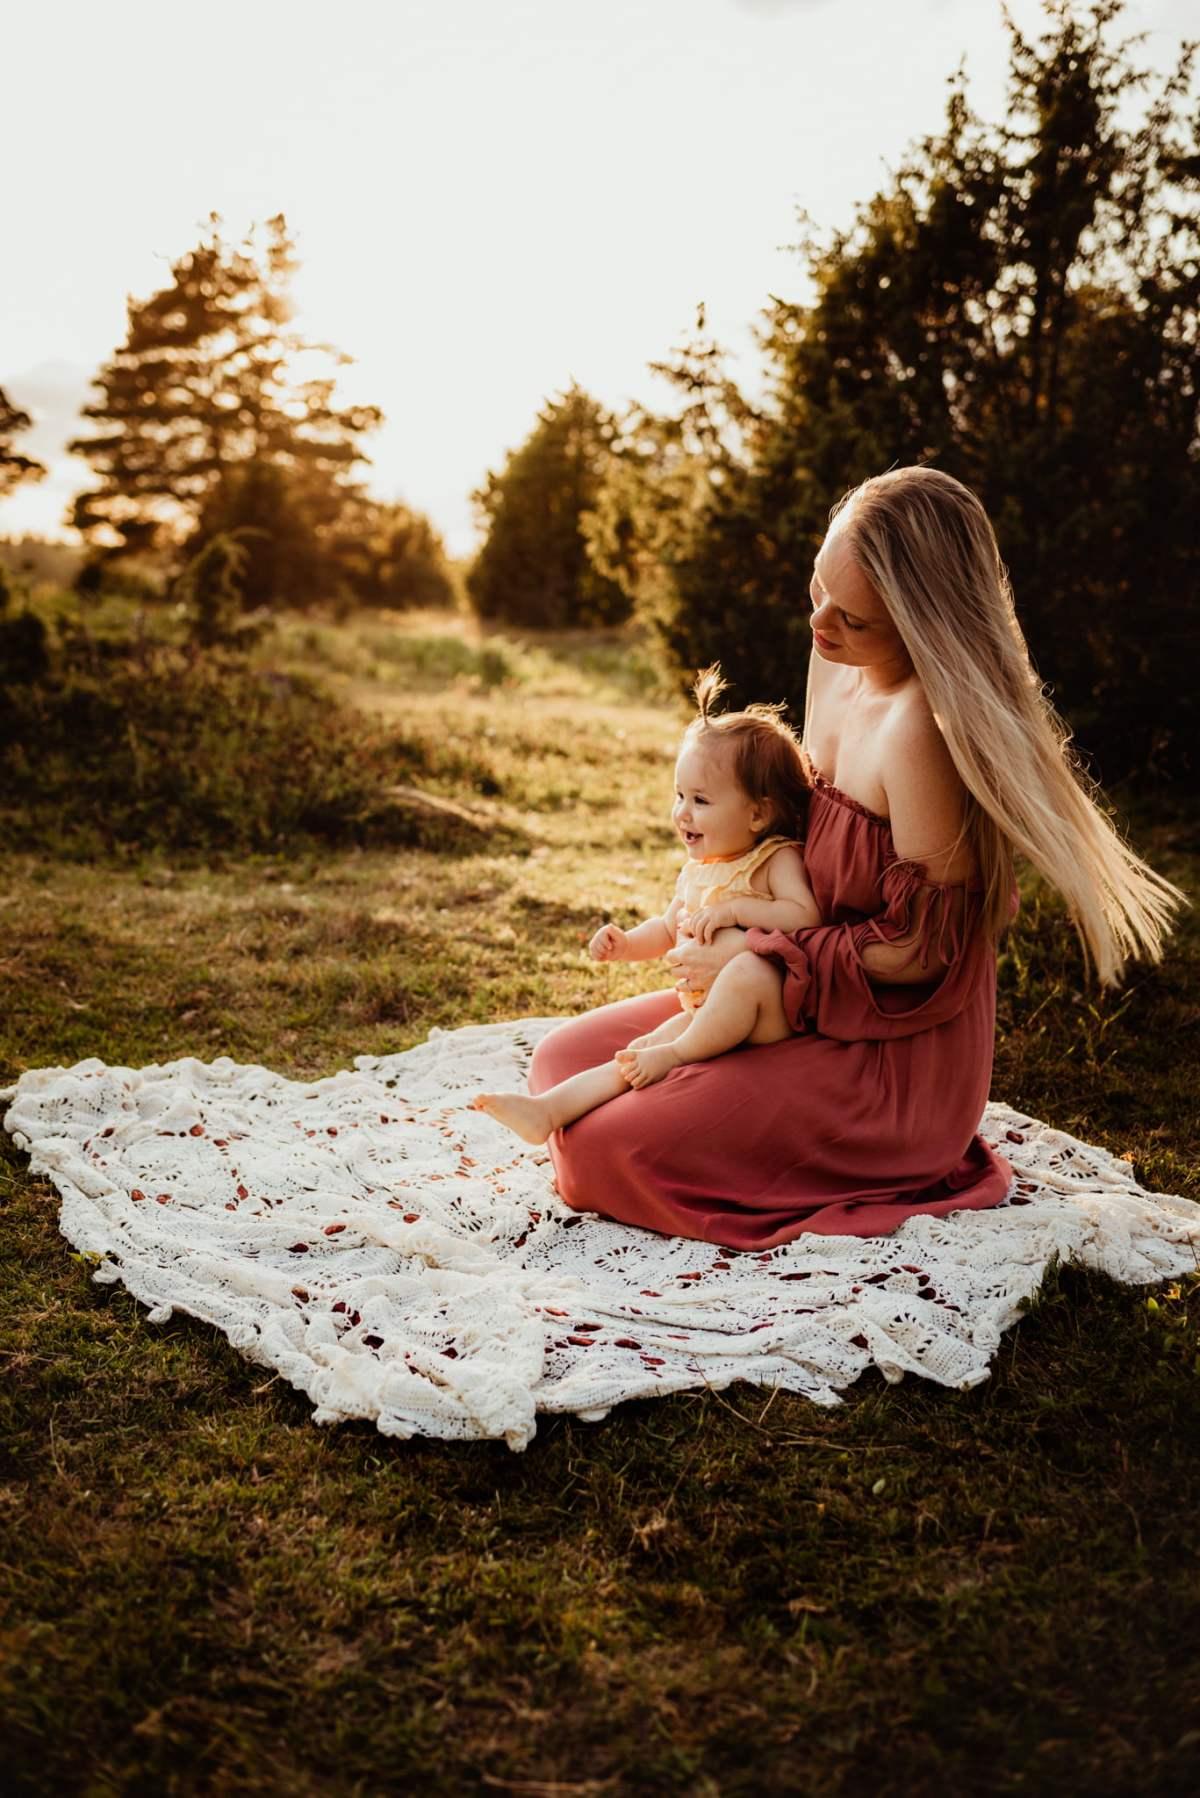 Familjefotografering Stockholm - Jasmine 21